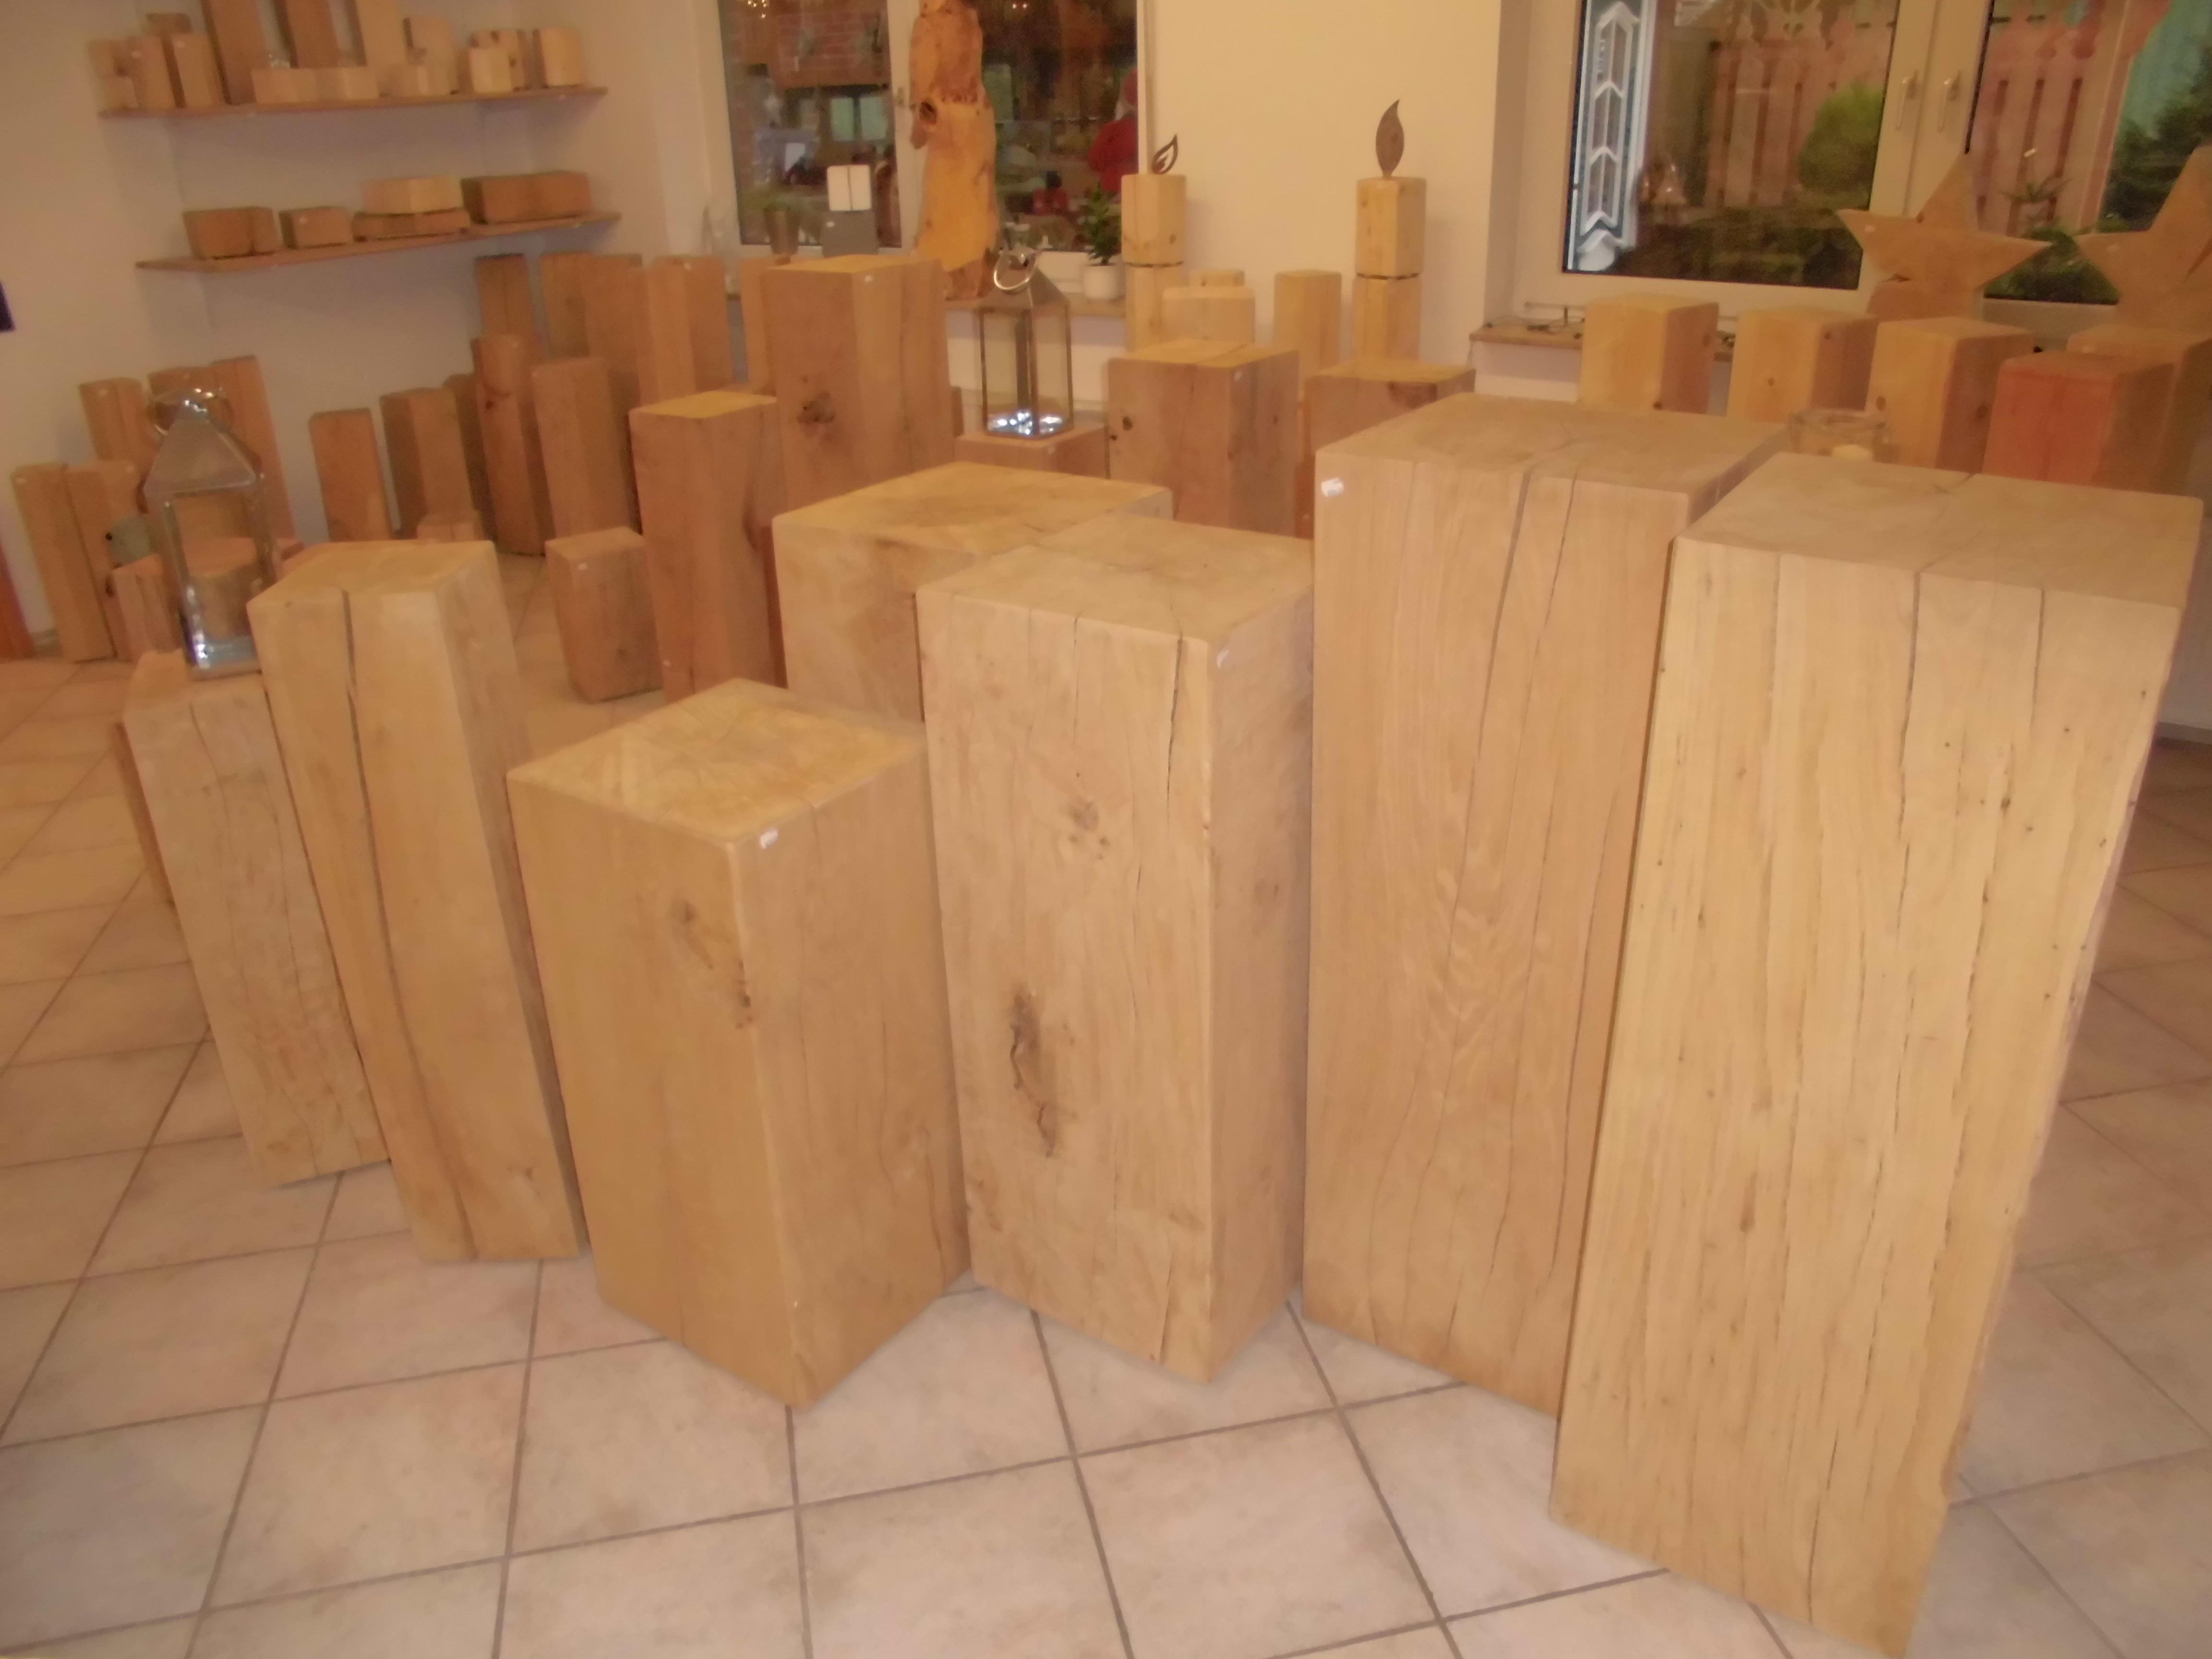 Eichenholzsäule gehobelt, geschliffen, angefast 30x30x100cm